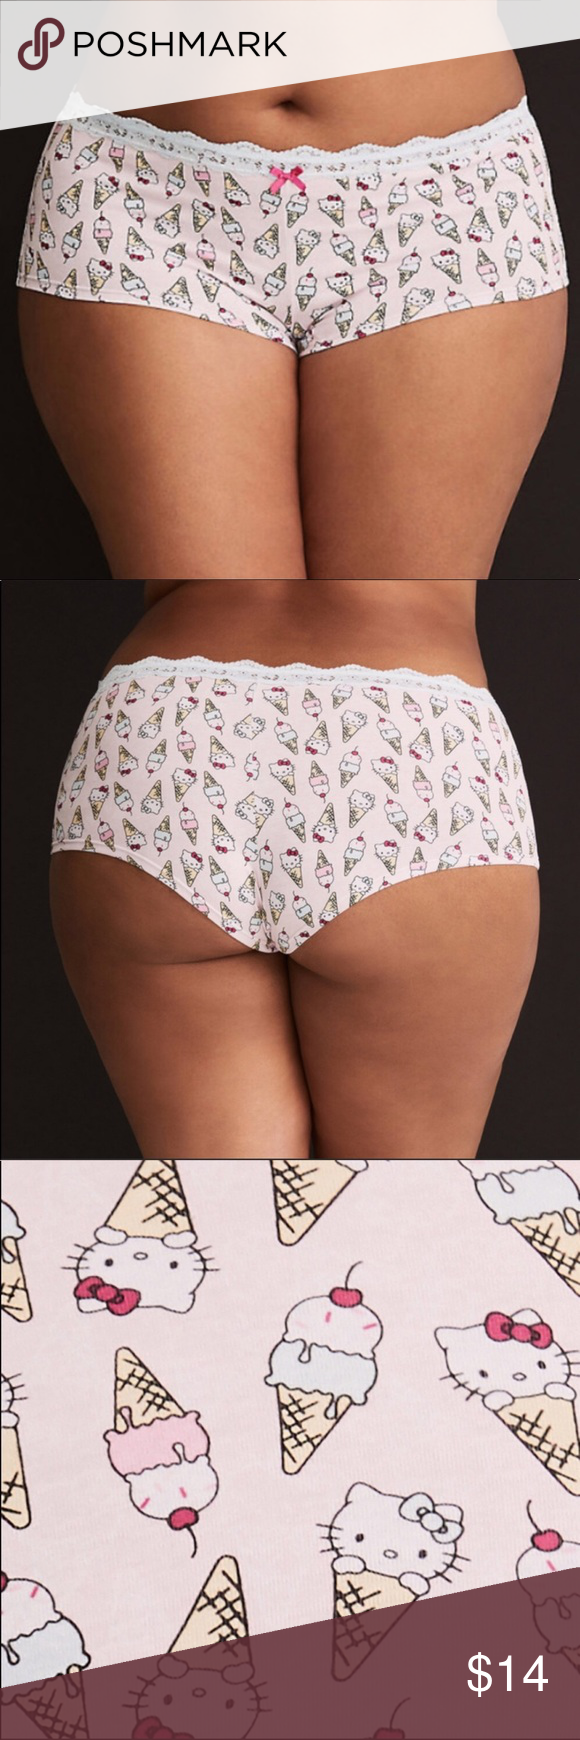 cream in my panties